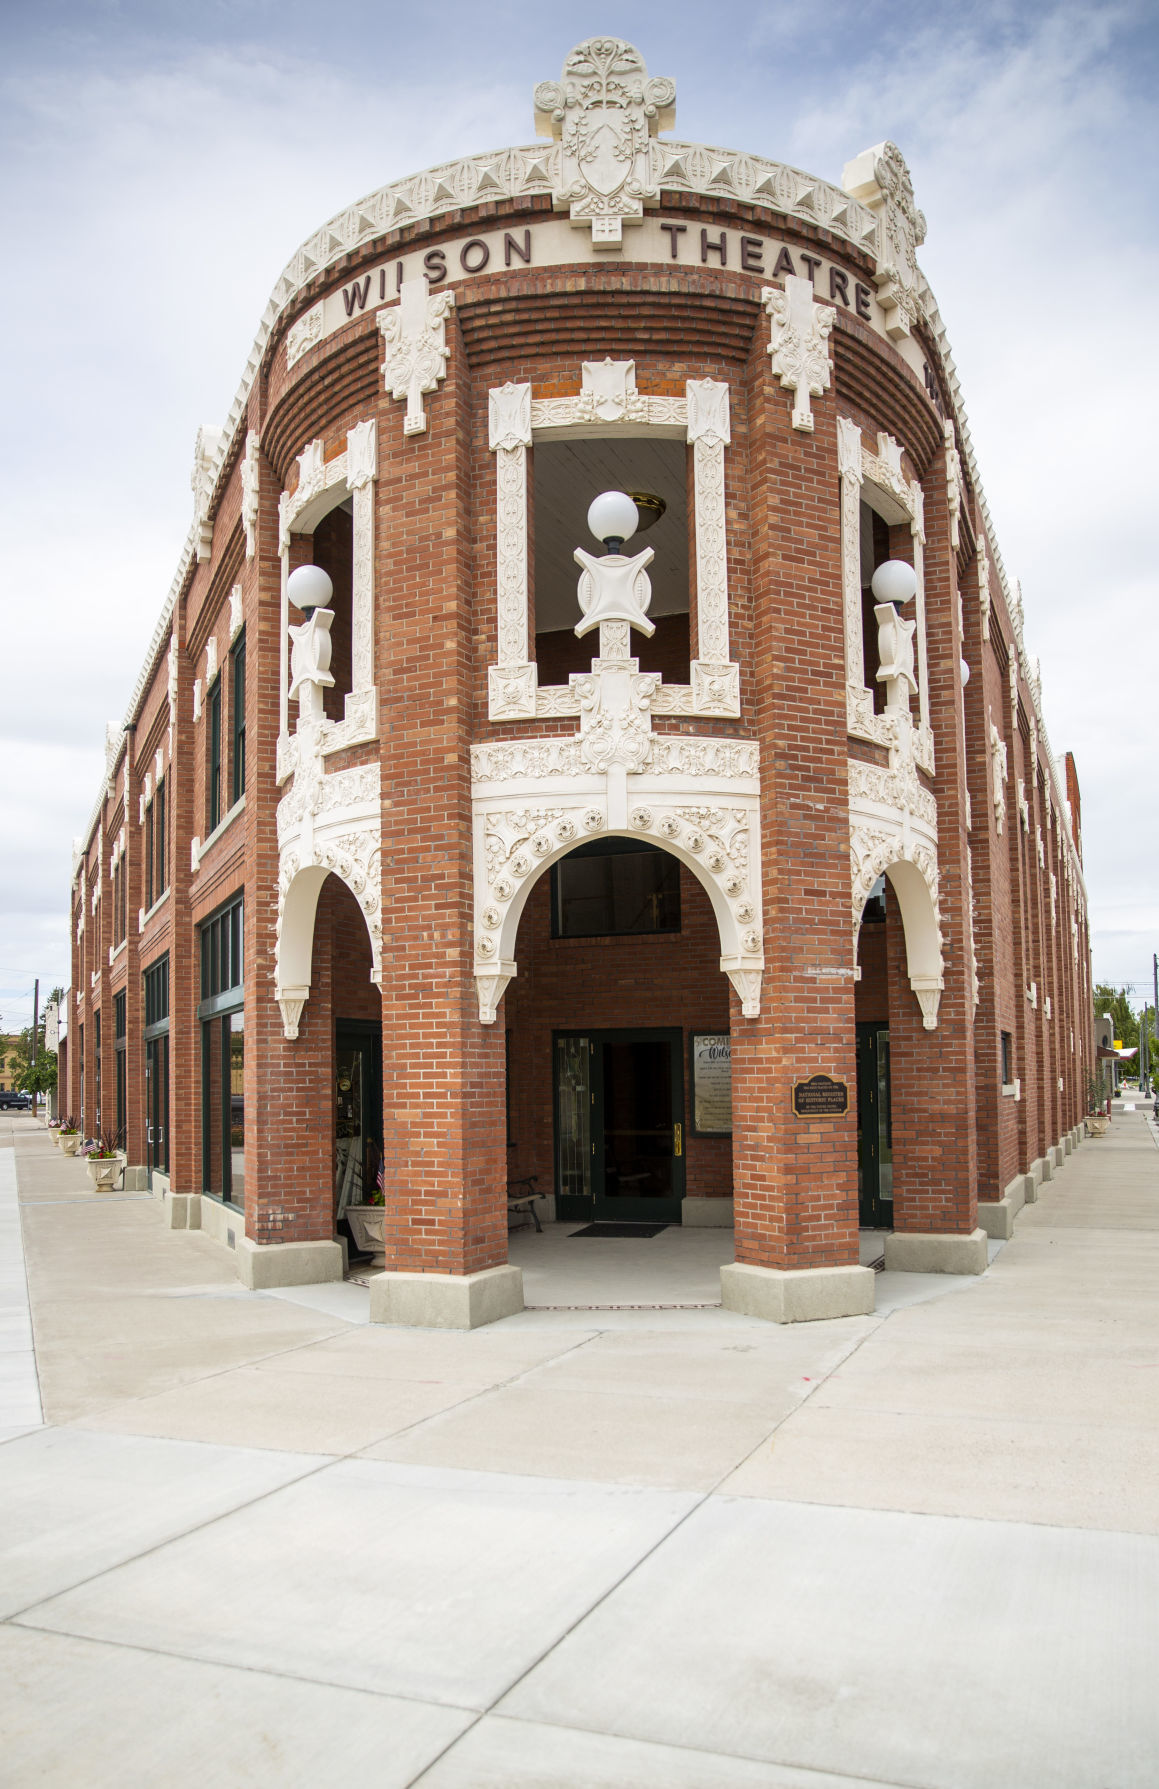 The Historic Wilson Theatre